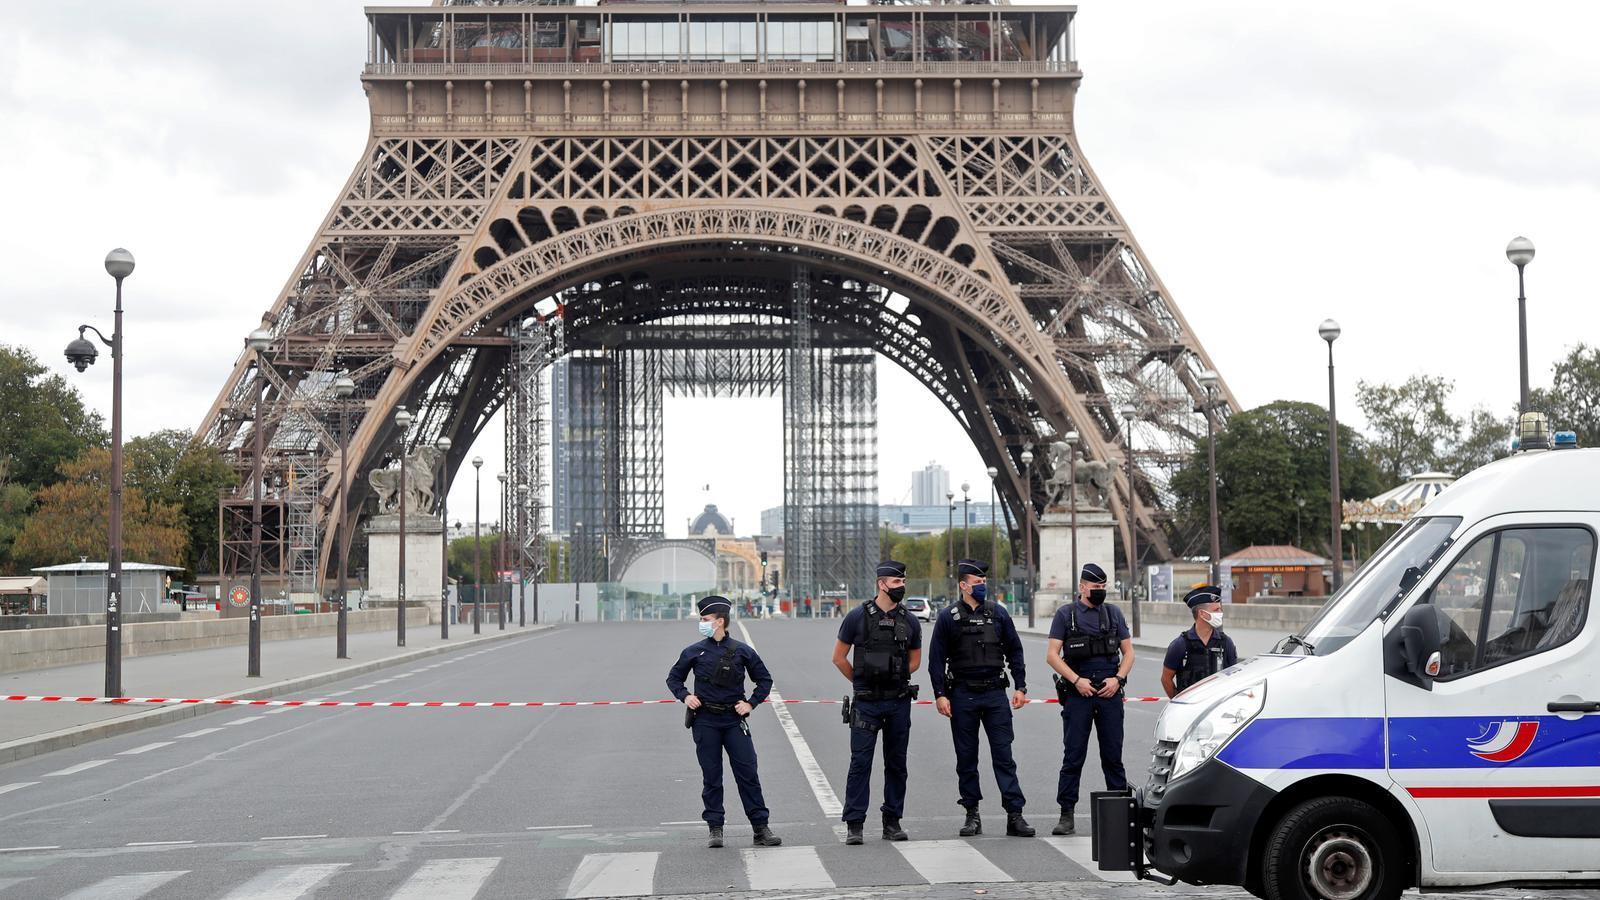 Un grup de policies francesos davant la Torre Eiffel de París, després de ser evacuada per una possible amenaça de bomba